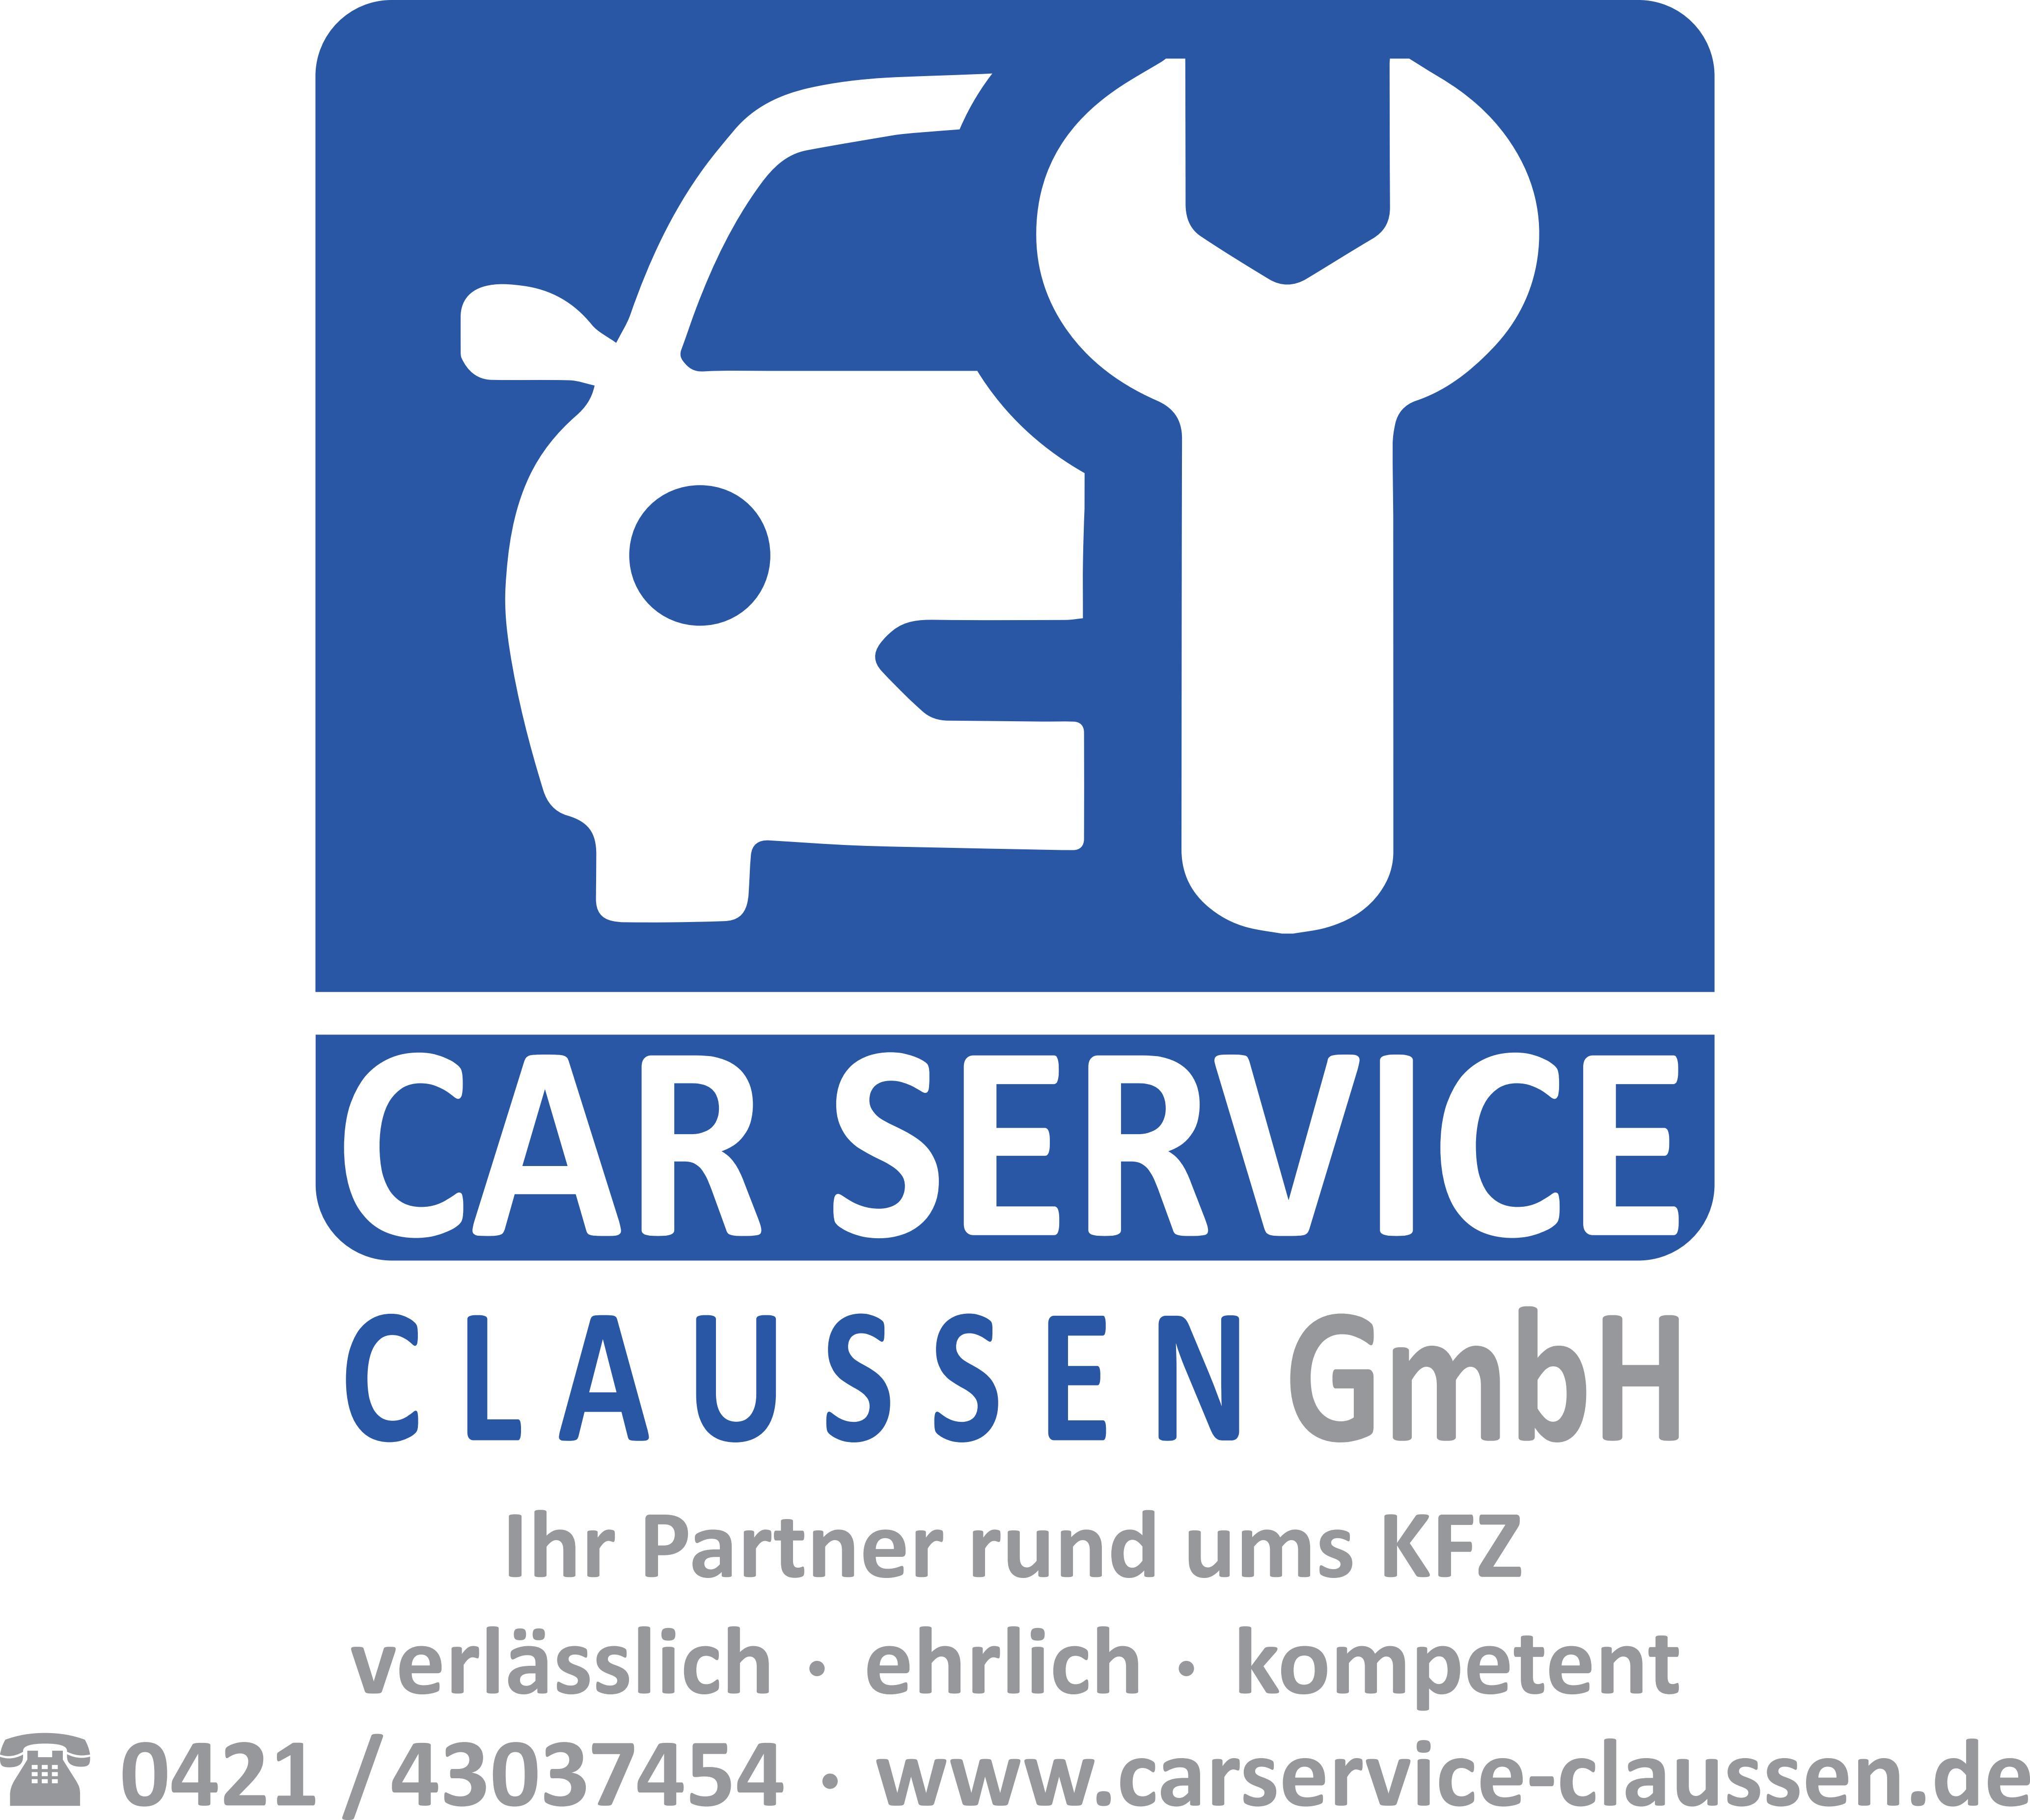 Car Service Claussen GmbH logo